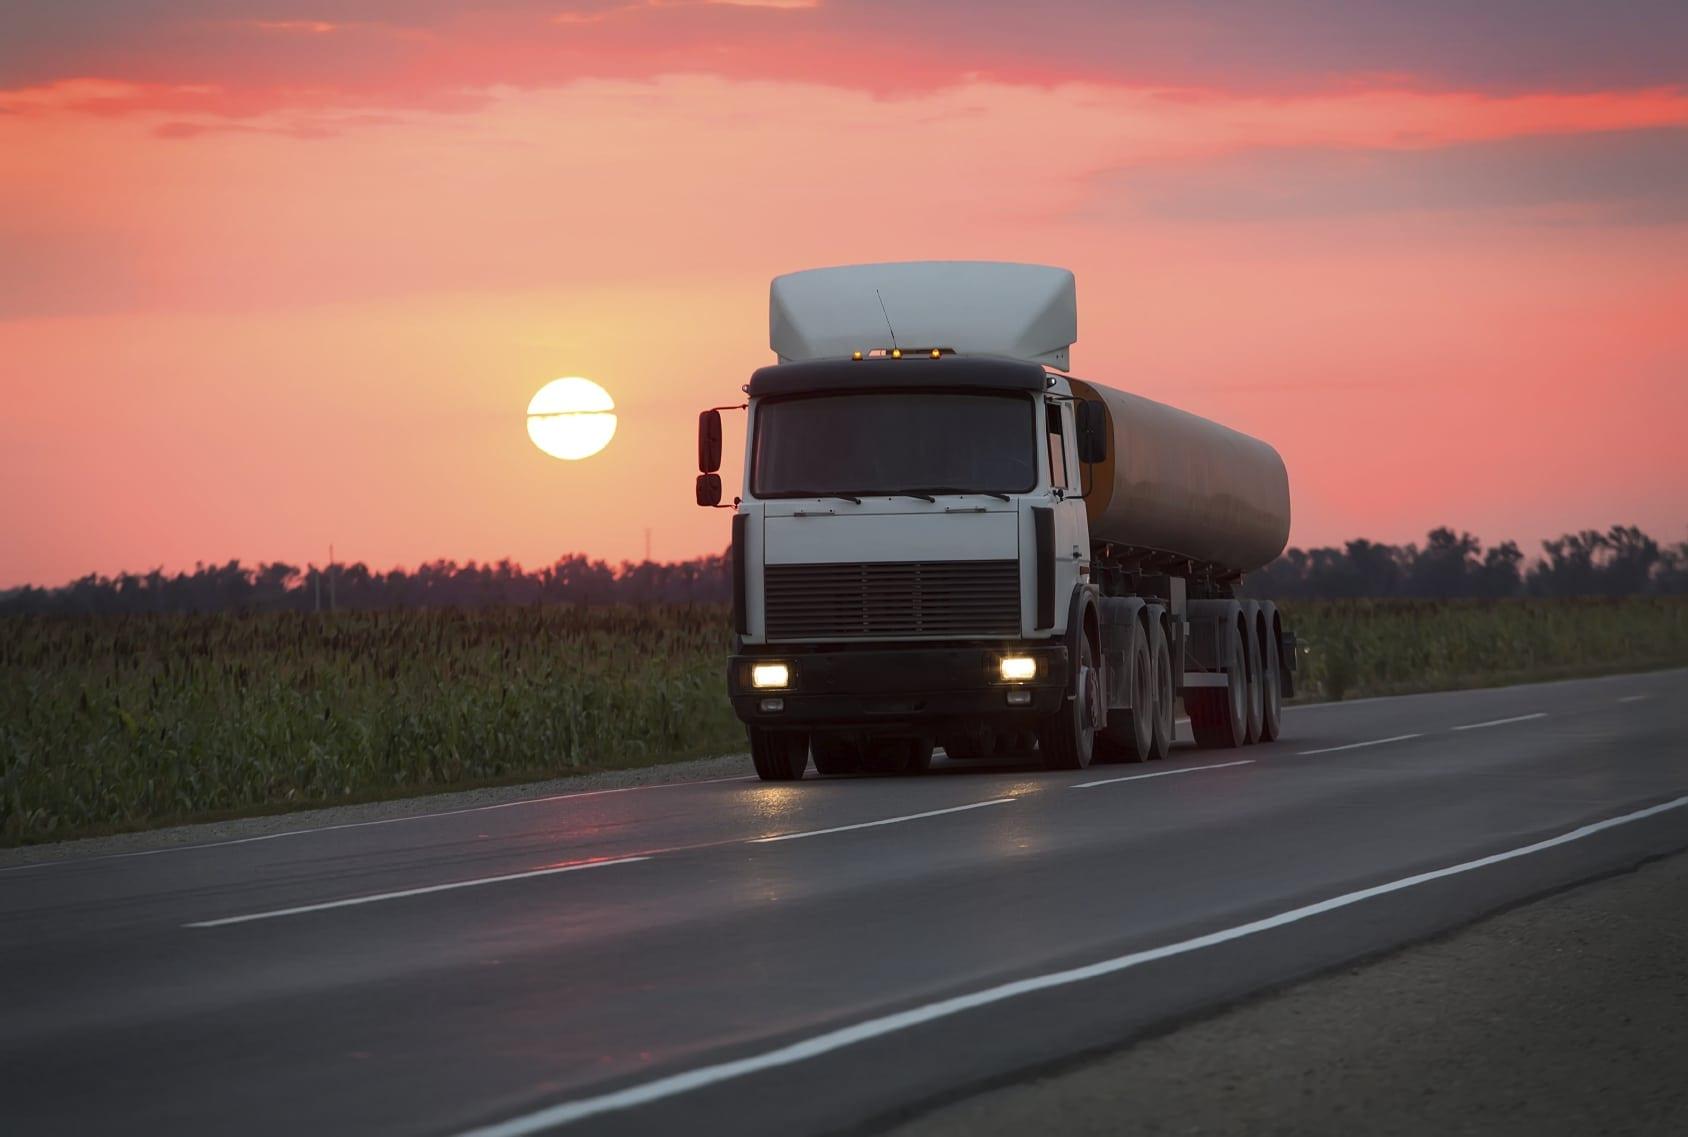 18-wheeler Truck Driving At Dusk Stock Photo